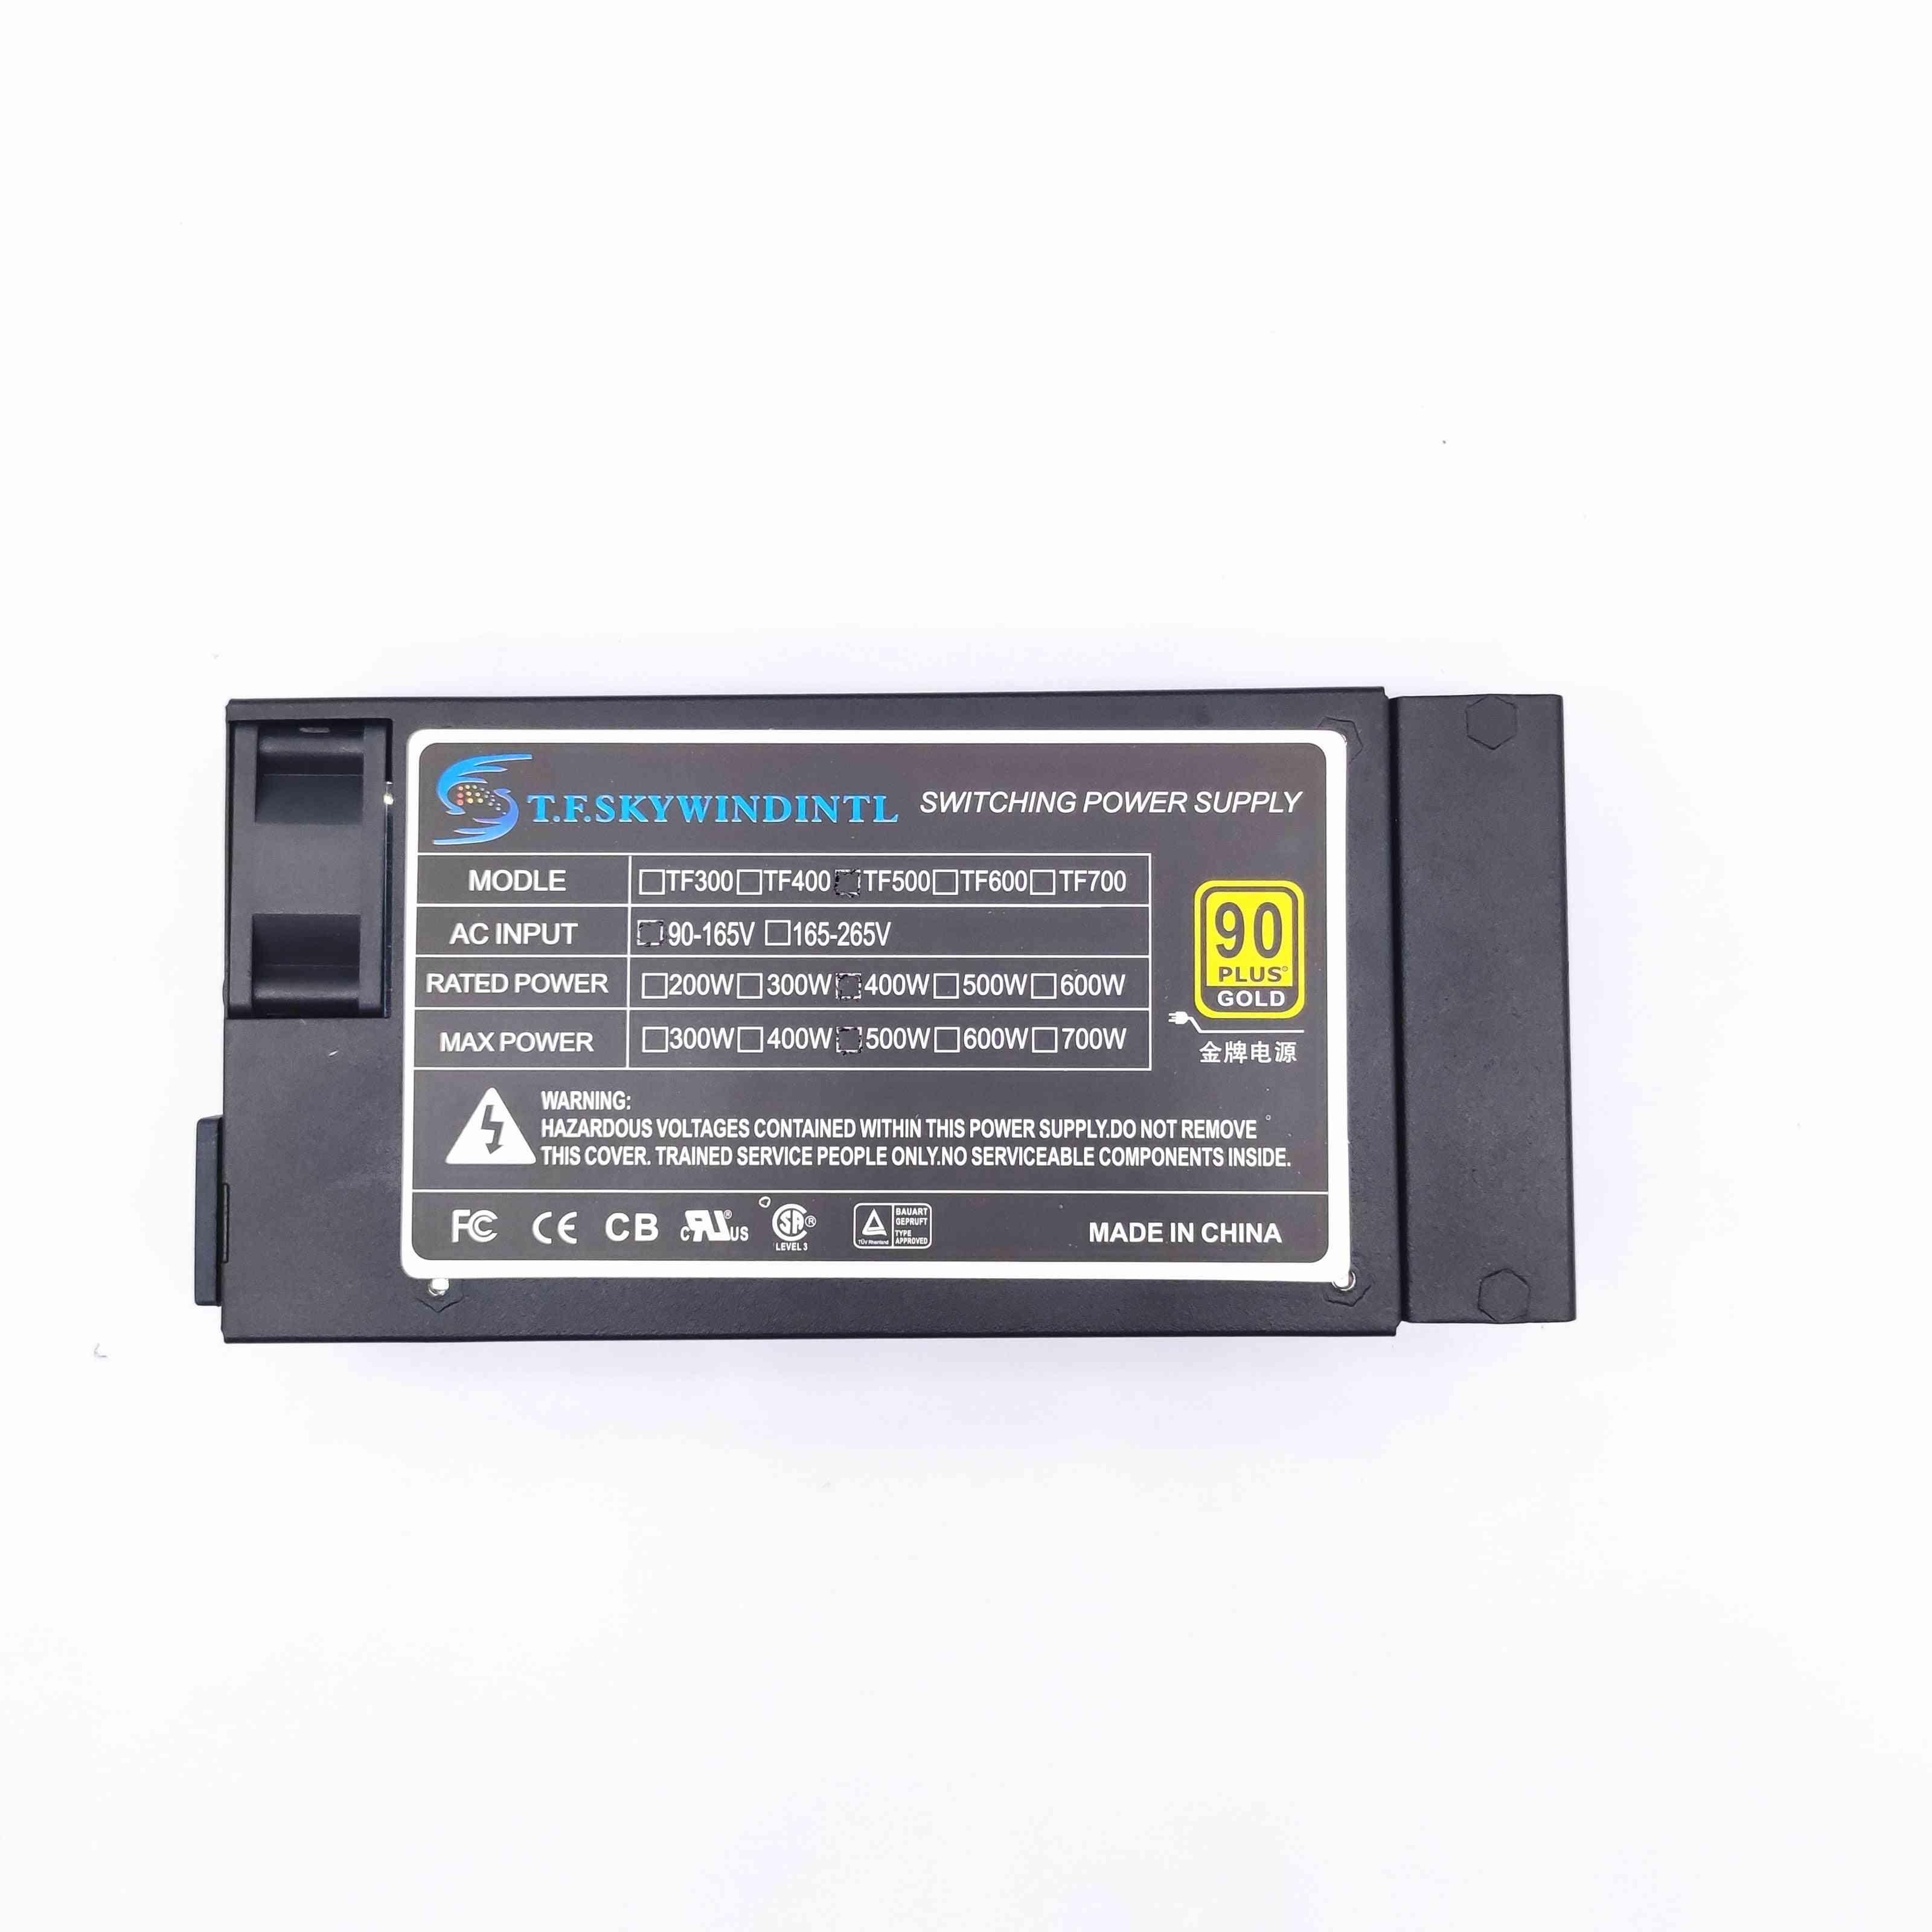 Flex 400w Psu Active Pfc 400w Atx Flex Full Modular Power Supply For Computer Pos Aio System